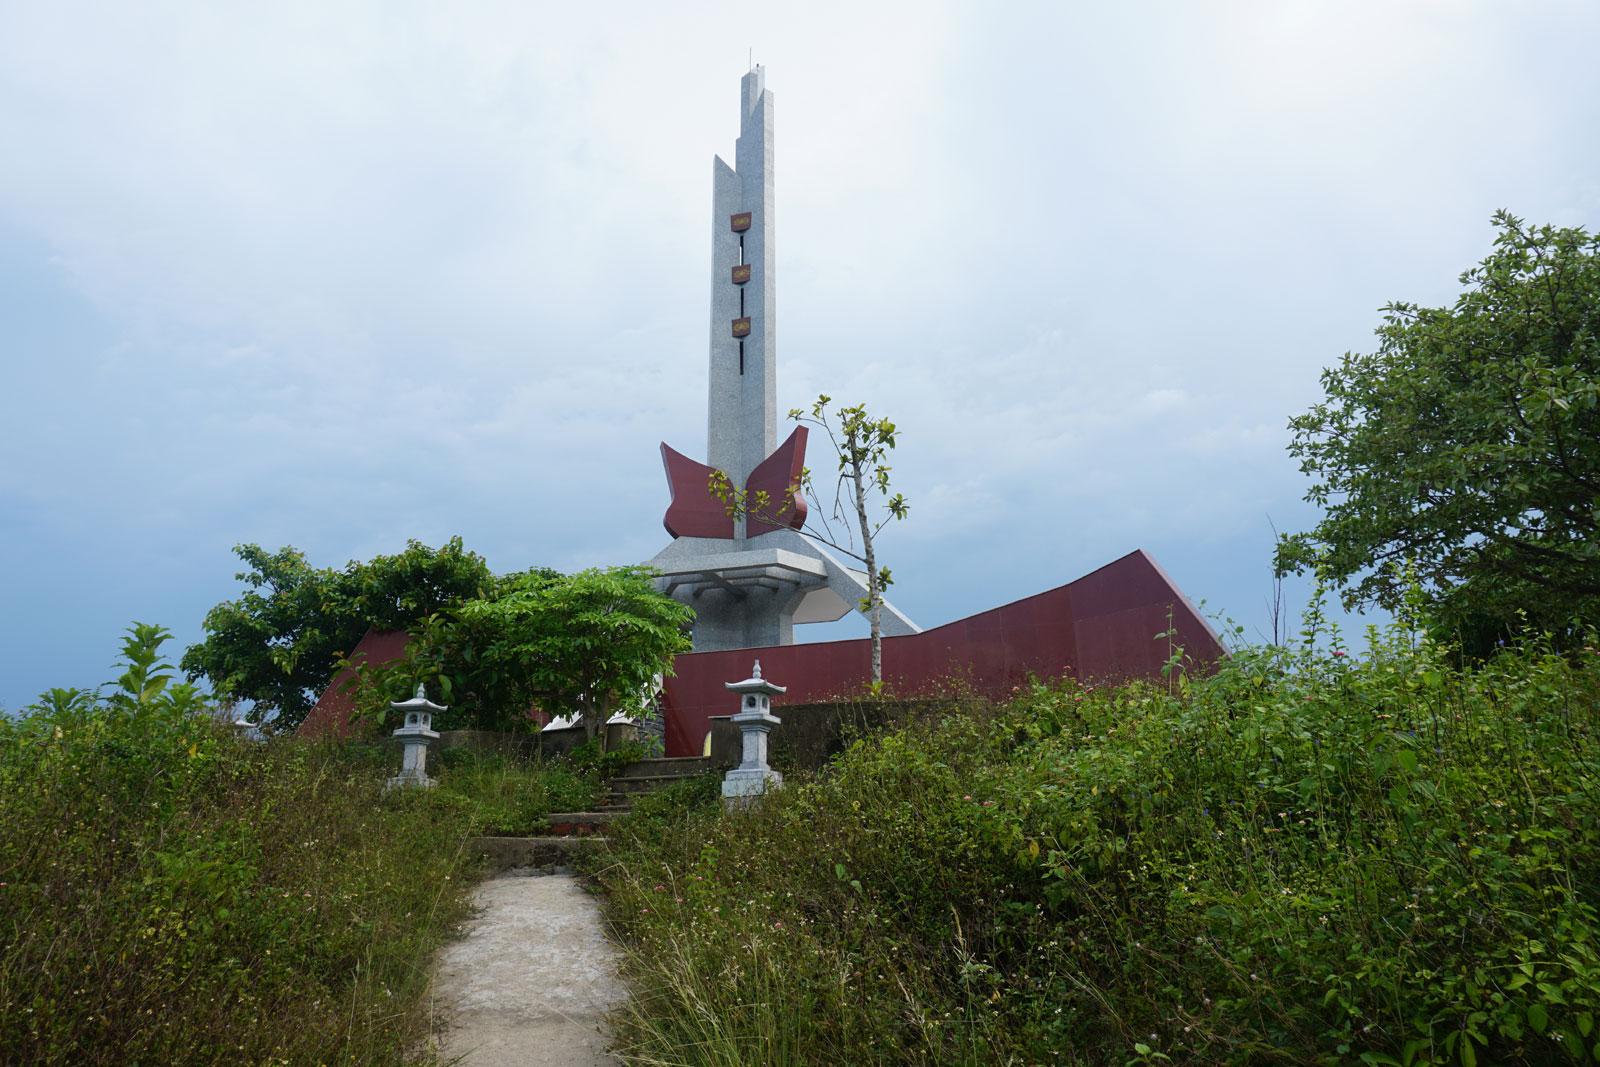 Đài tưởng niệm Cồn Cỏ